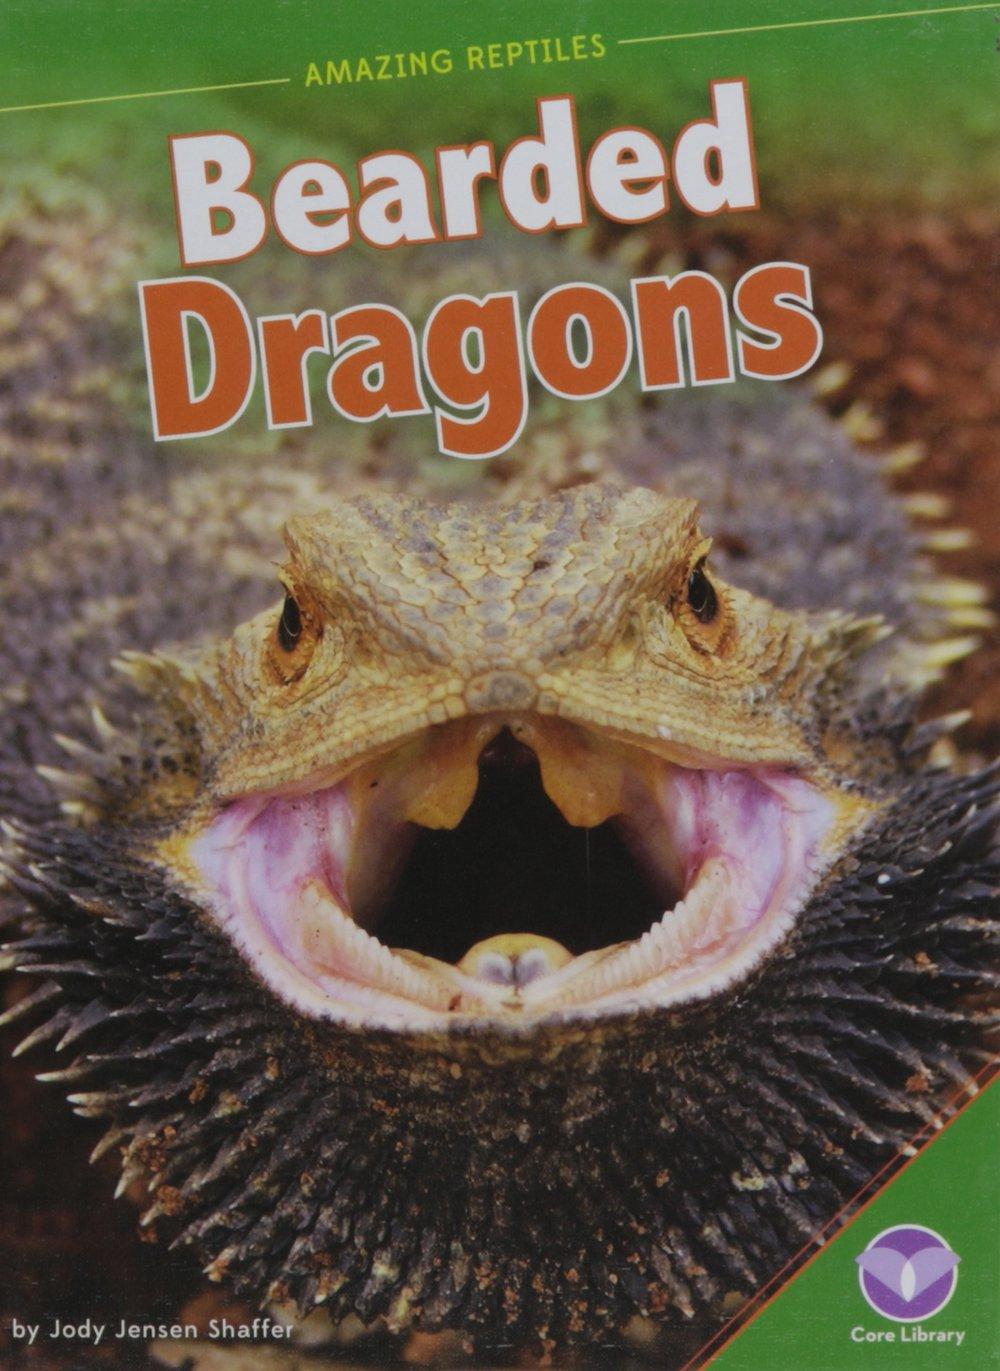 Amazing Reptiles, Bearded Dragons.jpg